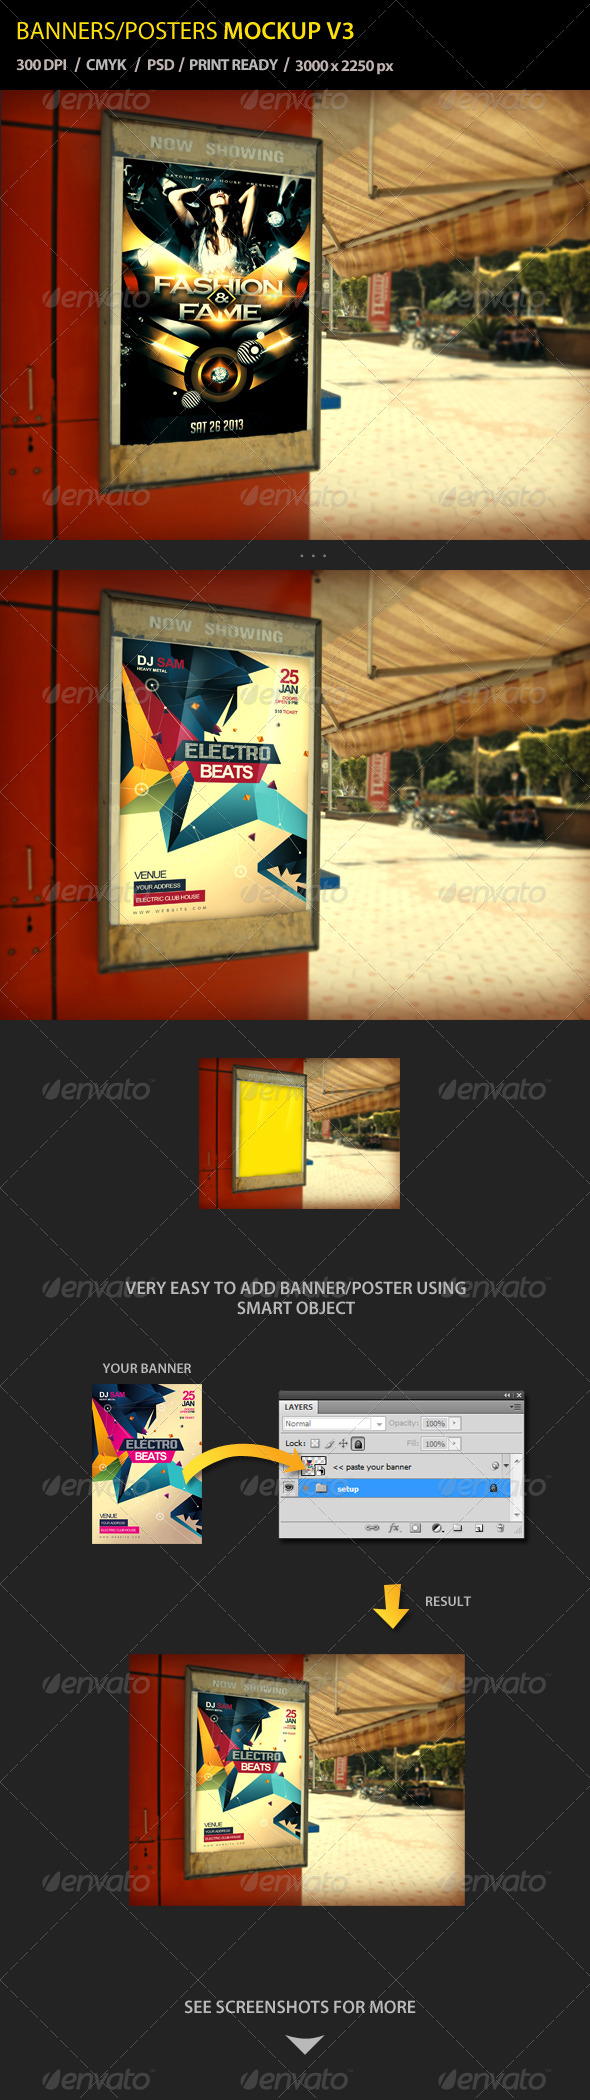 Banner / Poster Mockup V3 - Posters Print